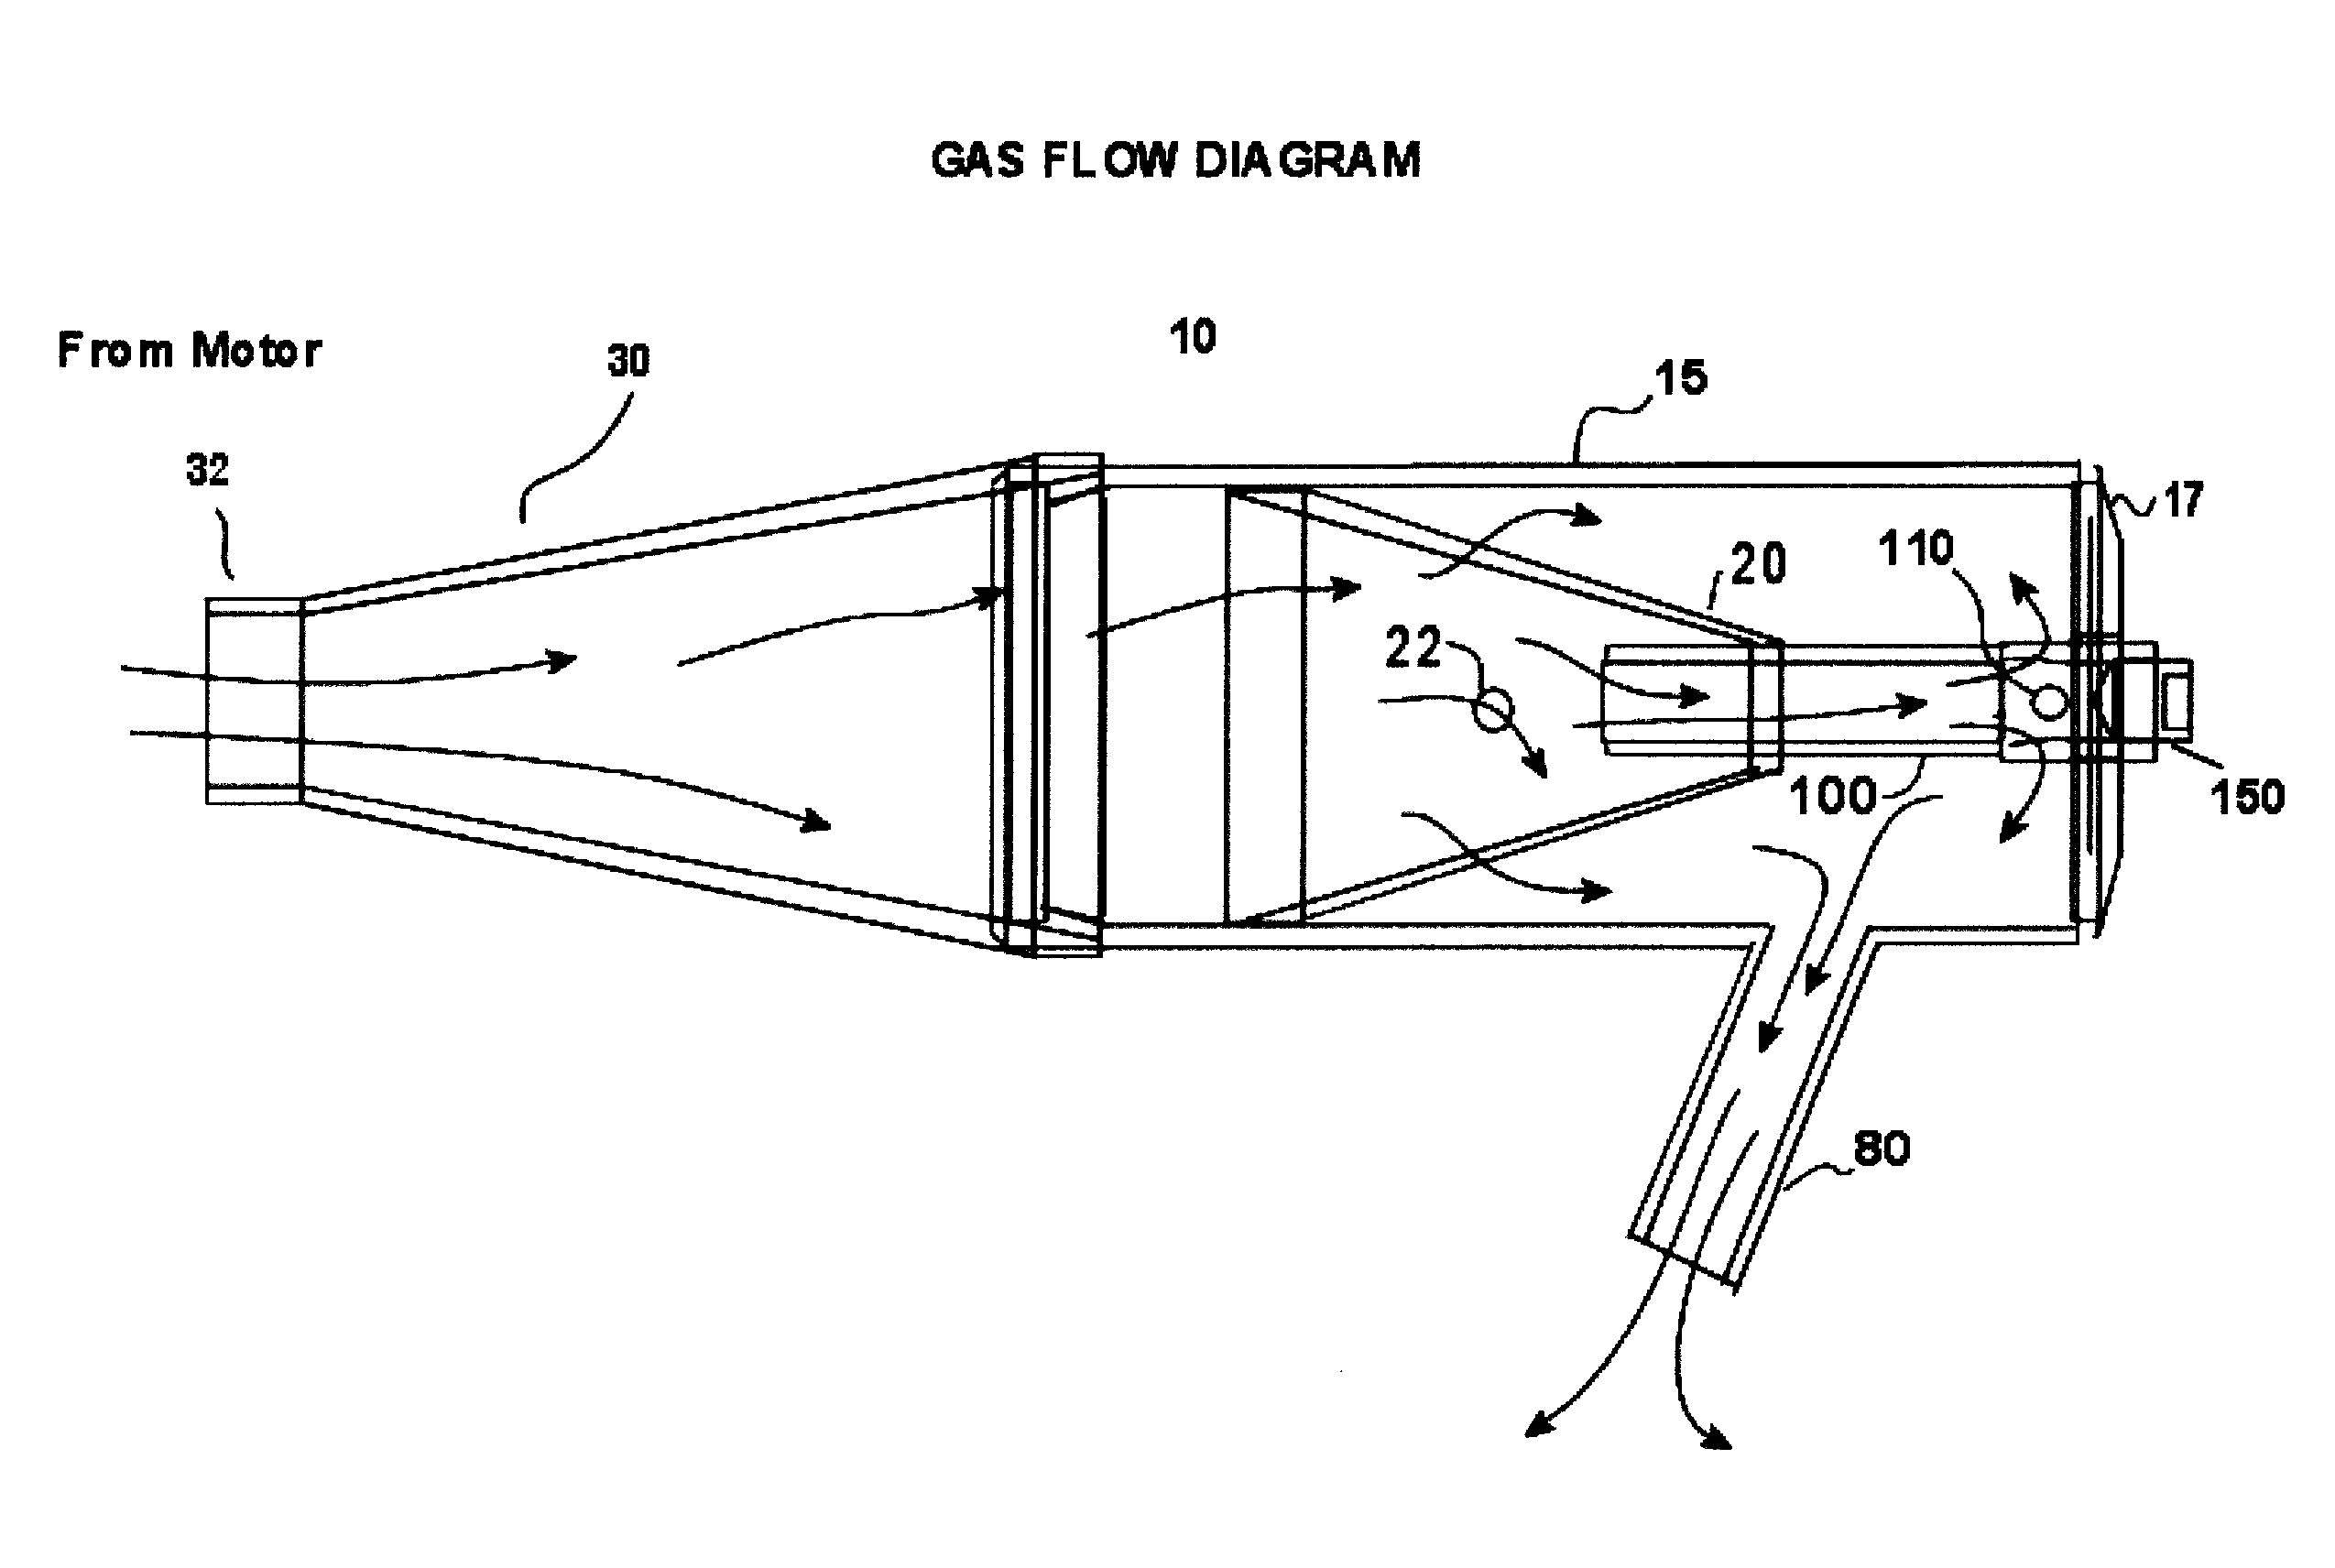 Two Stroke Muffler Diagram Modern Design Of Wiring 4 Motorcycle Engine Exhaust X Pipe Rh Exhaustnukumuka Blogspot Com 2 Carburetor